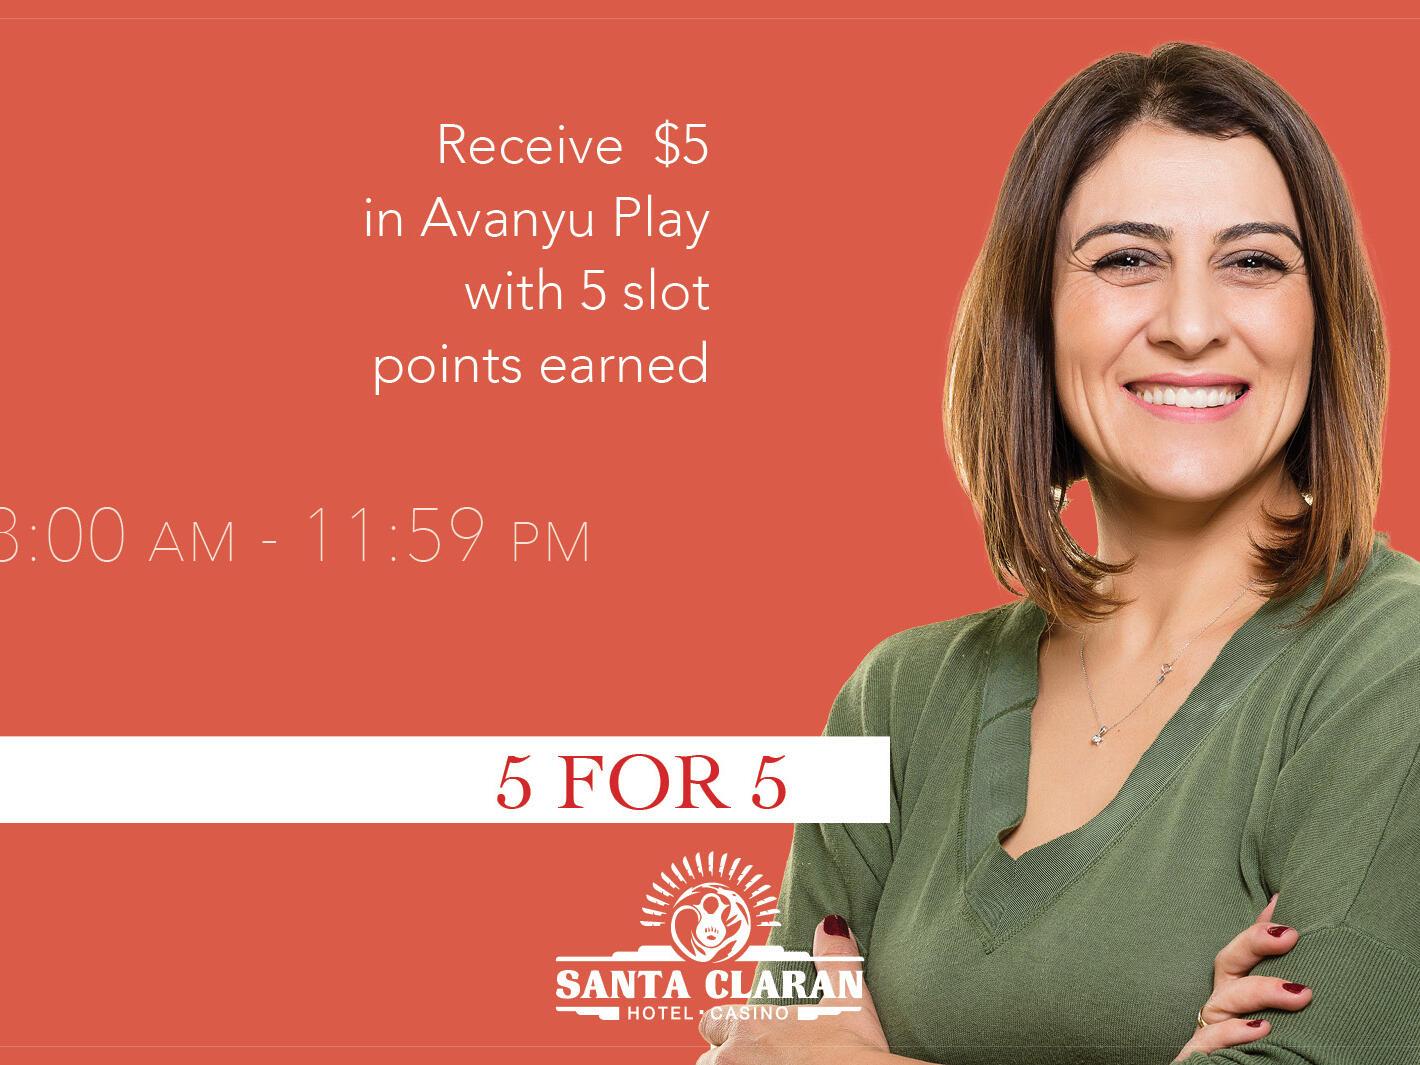 Poster of 5 FOR 5 at Santa Claran Hotel Casino